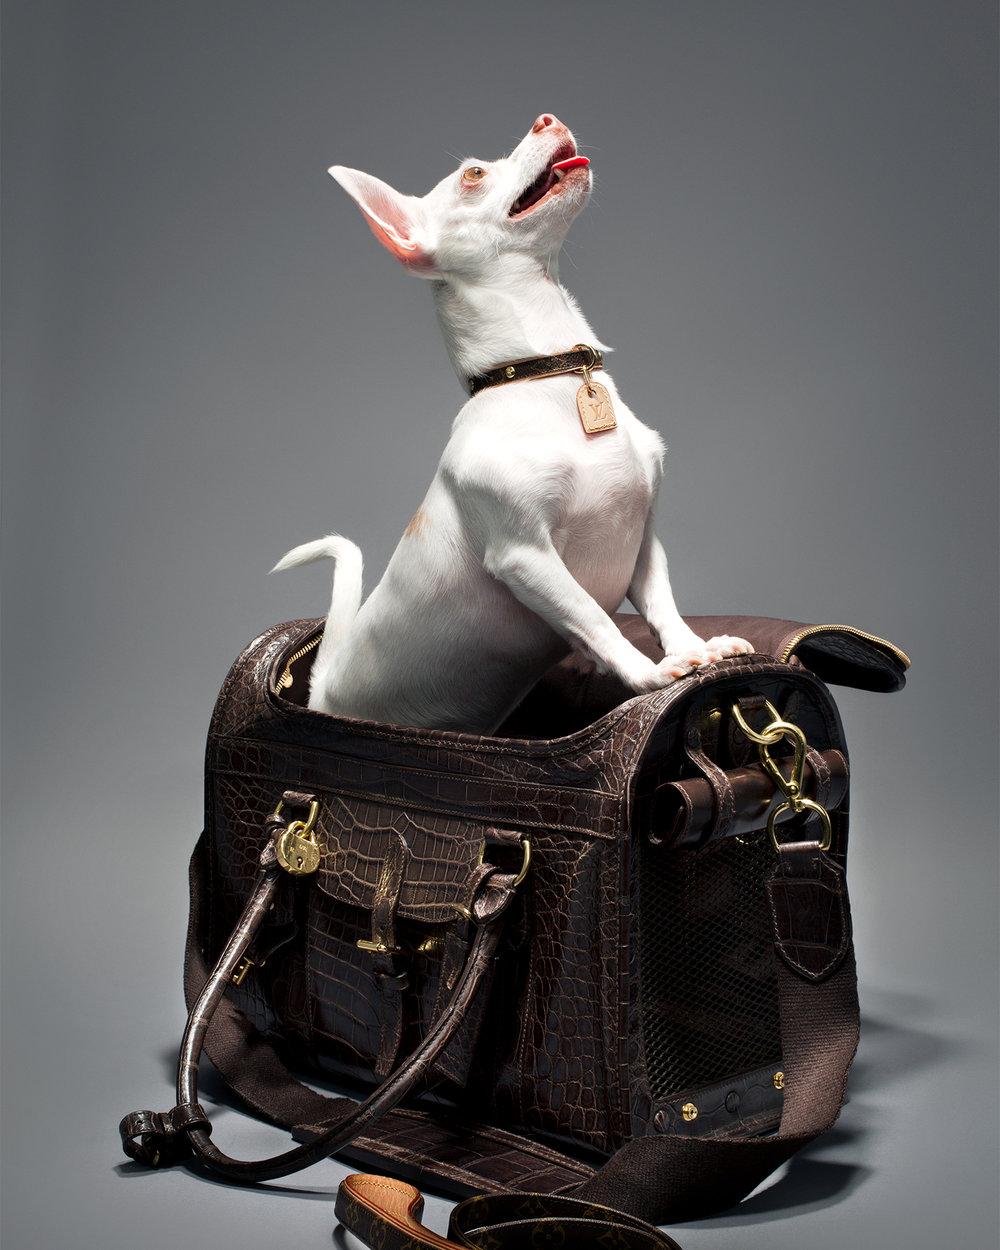 puppy 2 v2.jpg